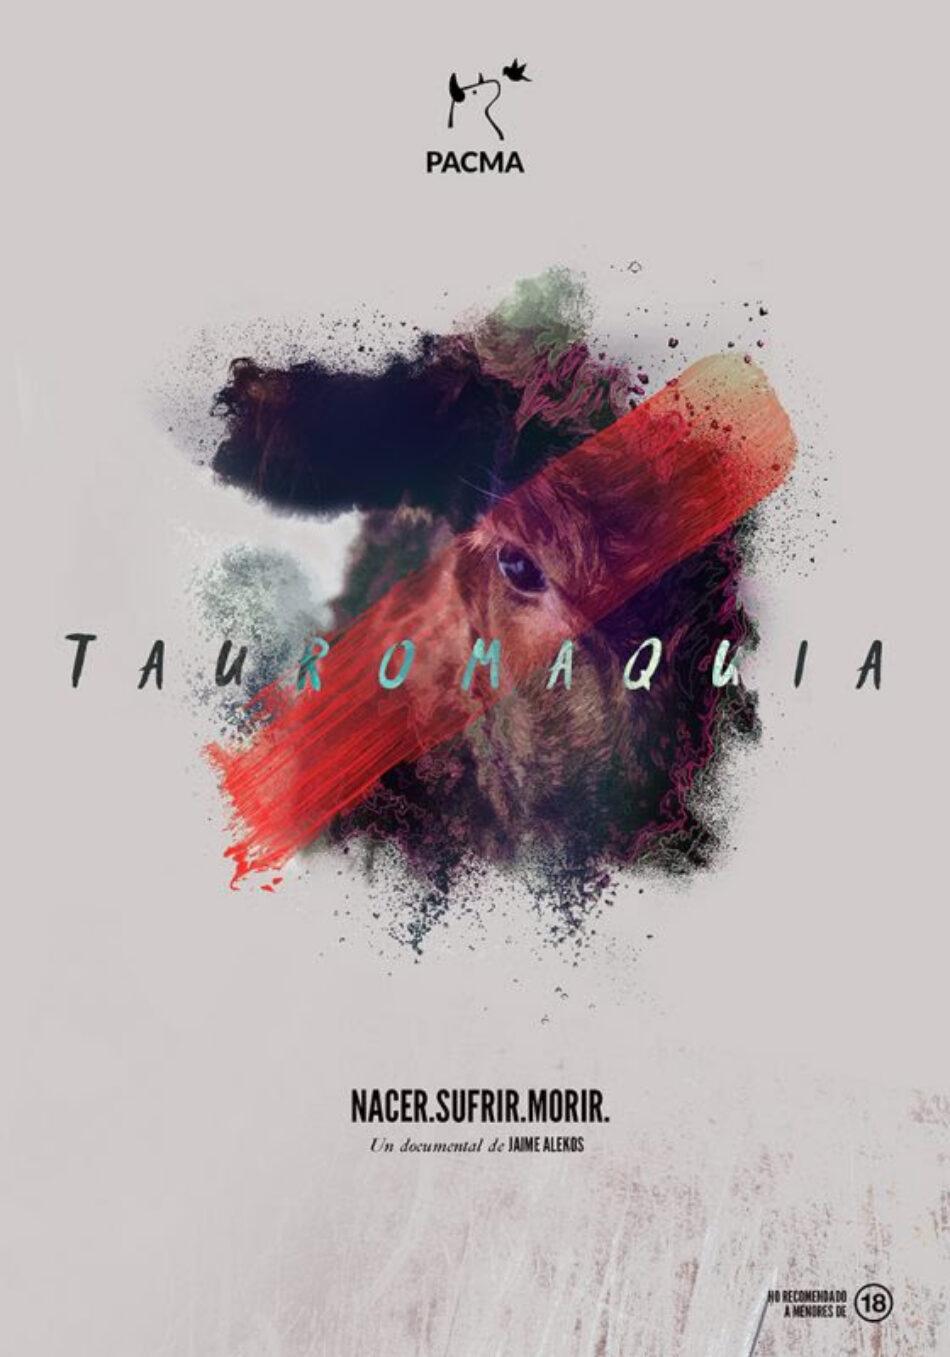 PACMA presenta 'Tauromaquia', un corto documental sobre la violenta muerte del toro